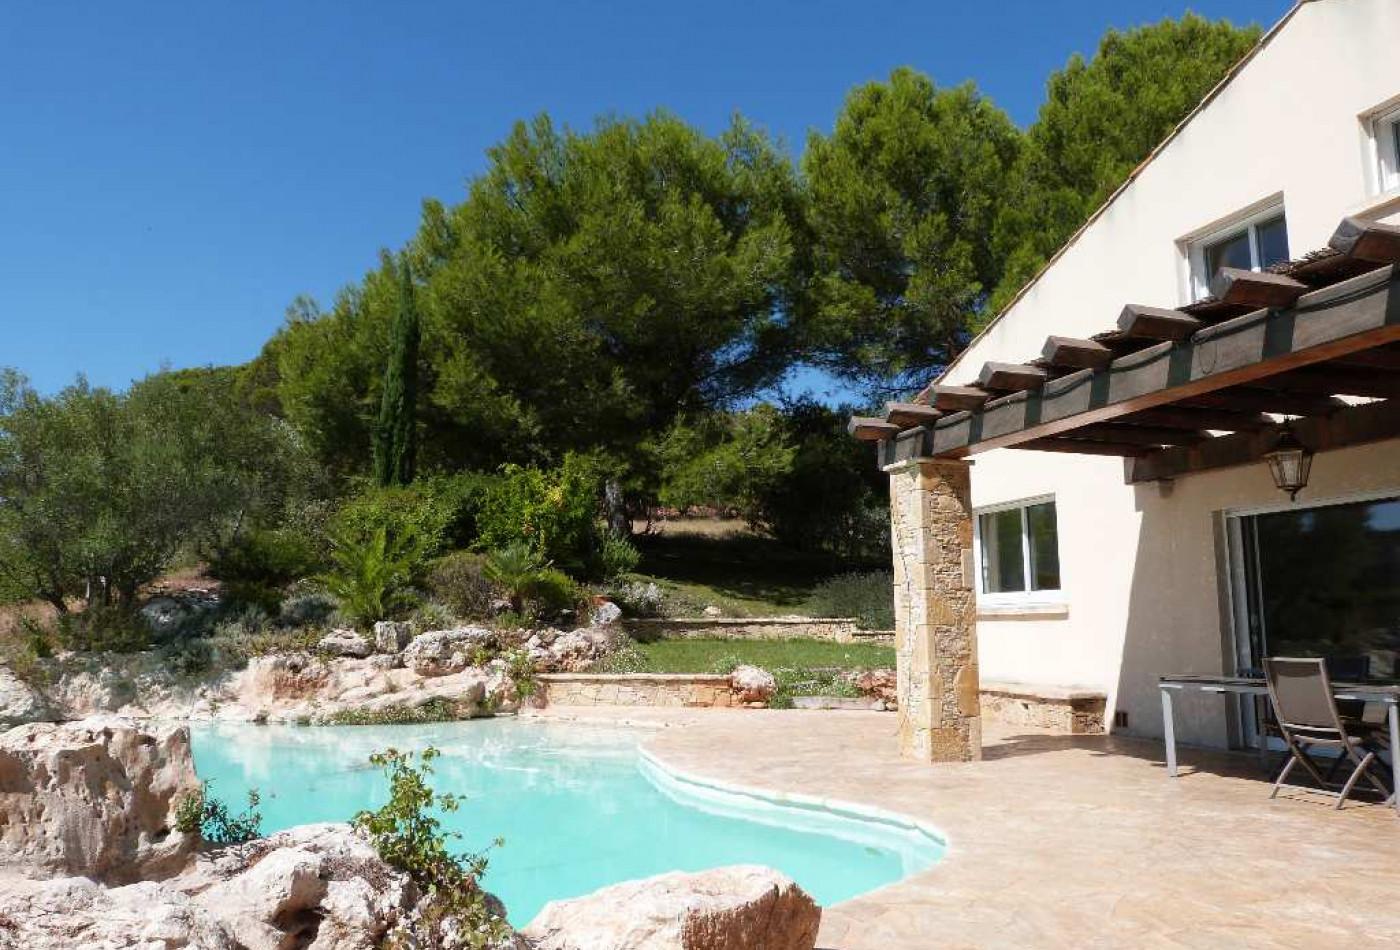 Villa en vente clermont l 39 herault r f340134923 agence for Garage ford clermont l herault